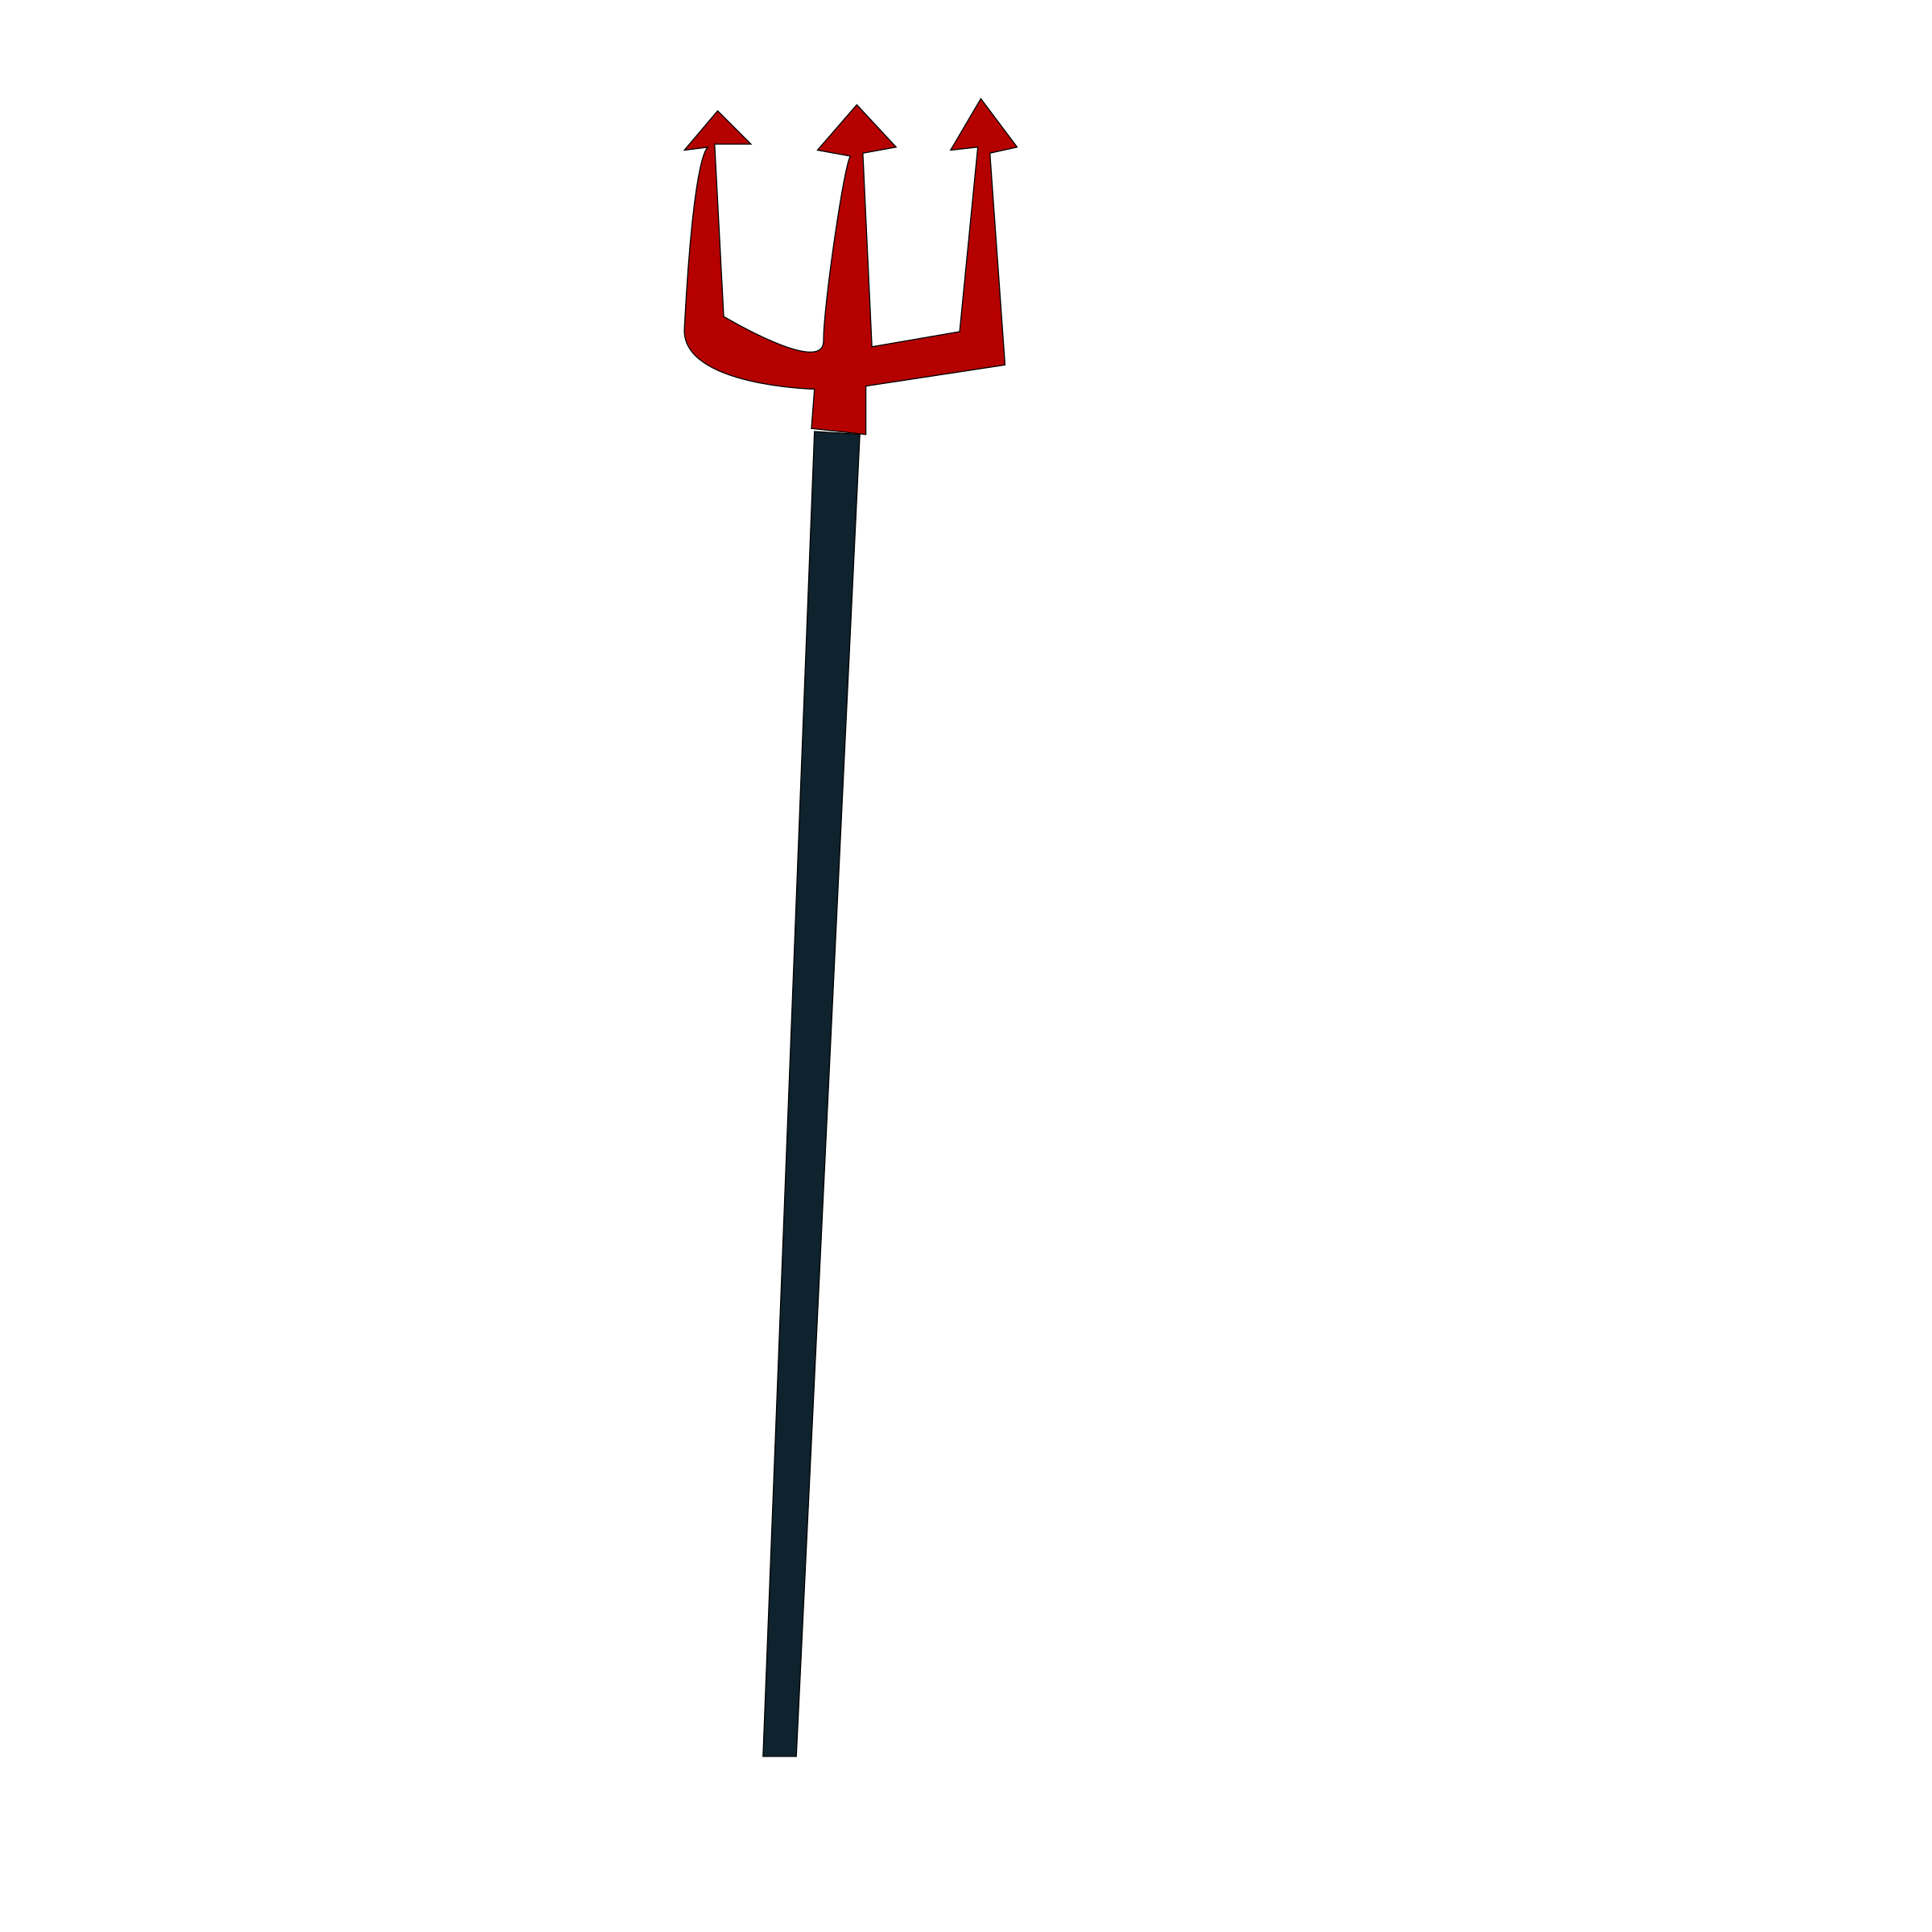 Devil clipart holding pitchfork. Group pitchforkicon